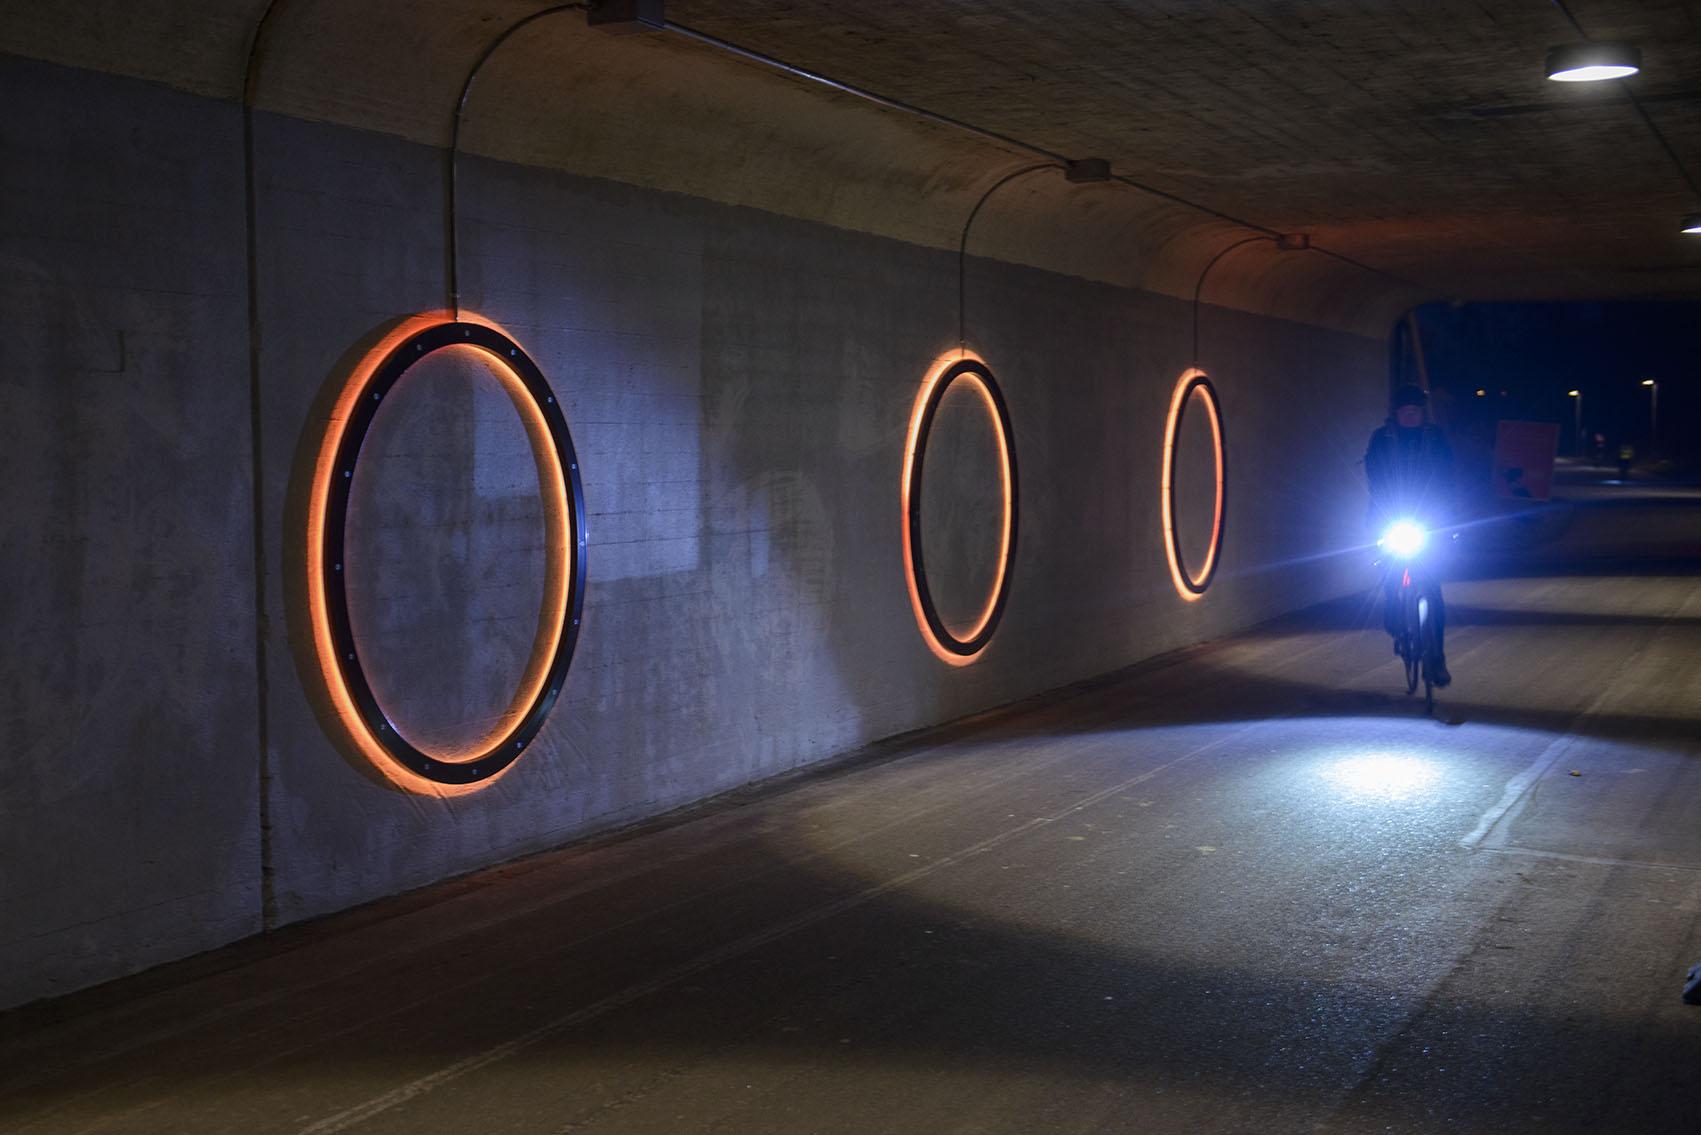 Adaptive lighting for Danish cyclists (c) Cycle Superhighways (1)